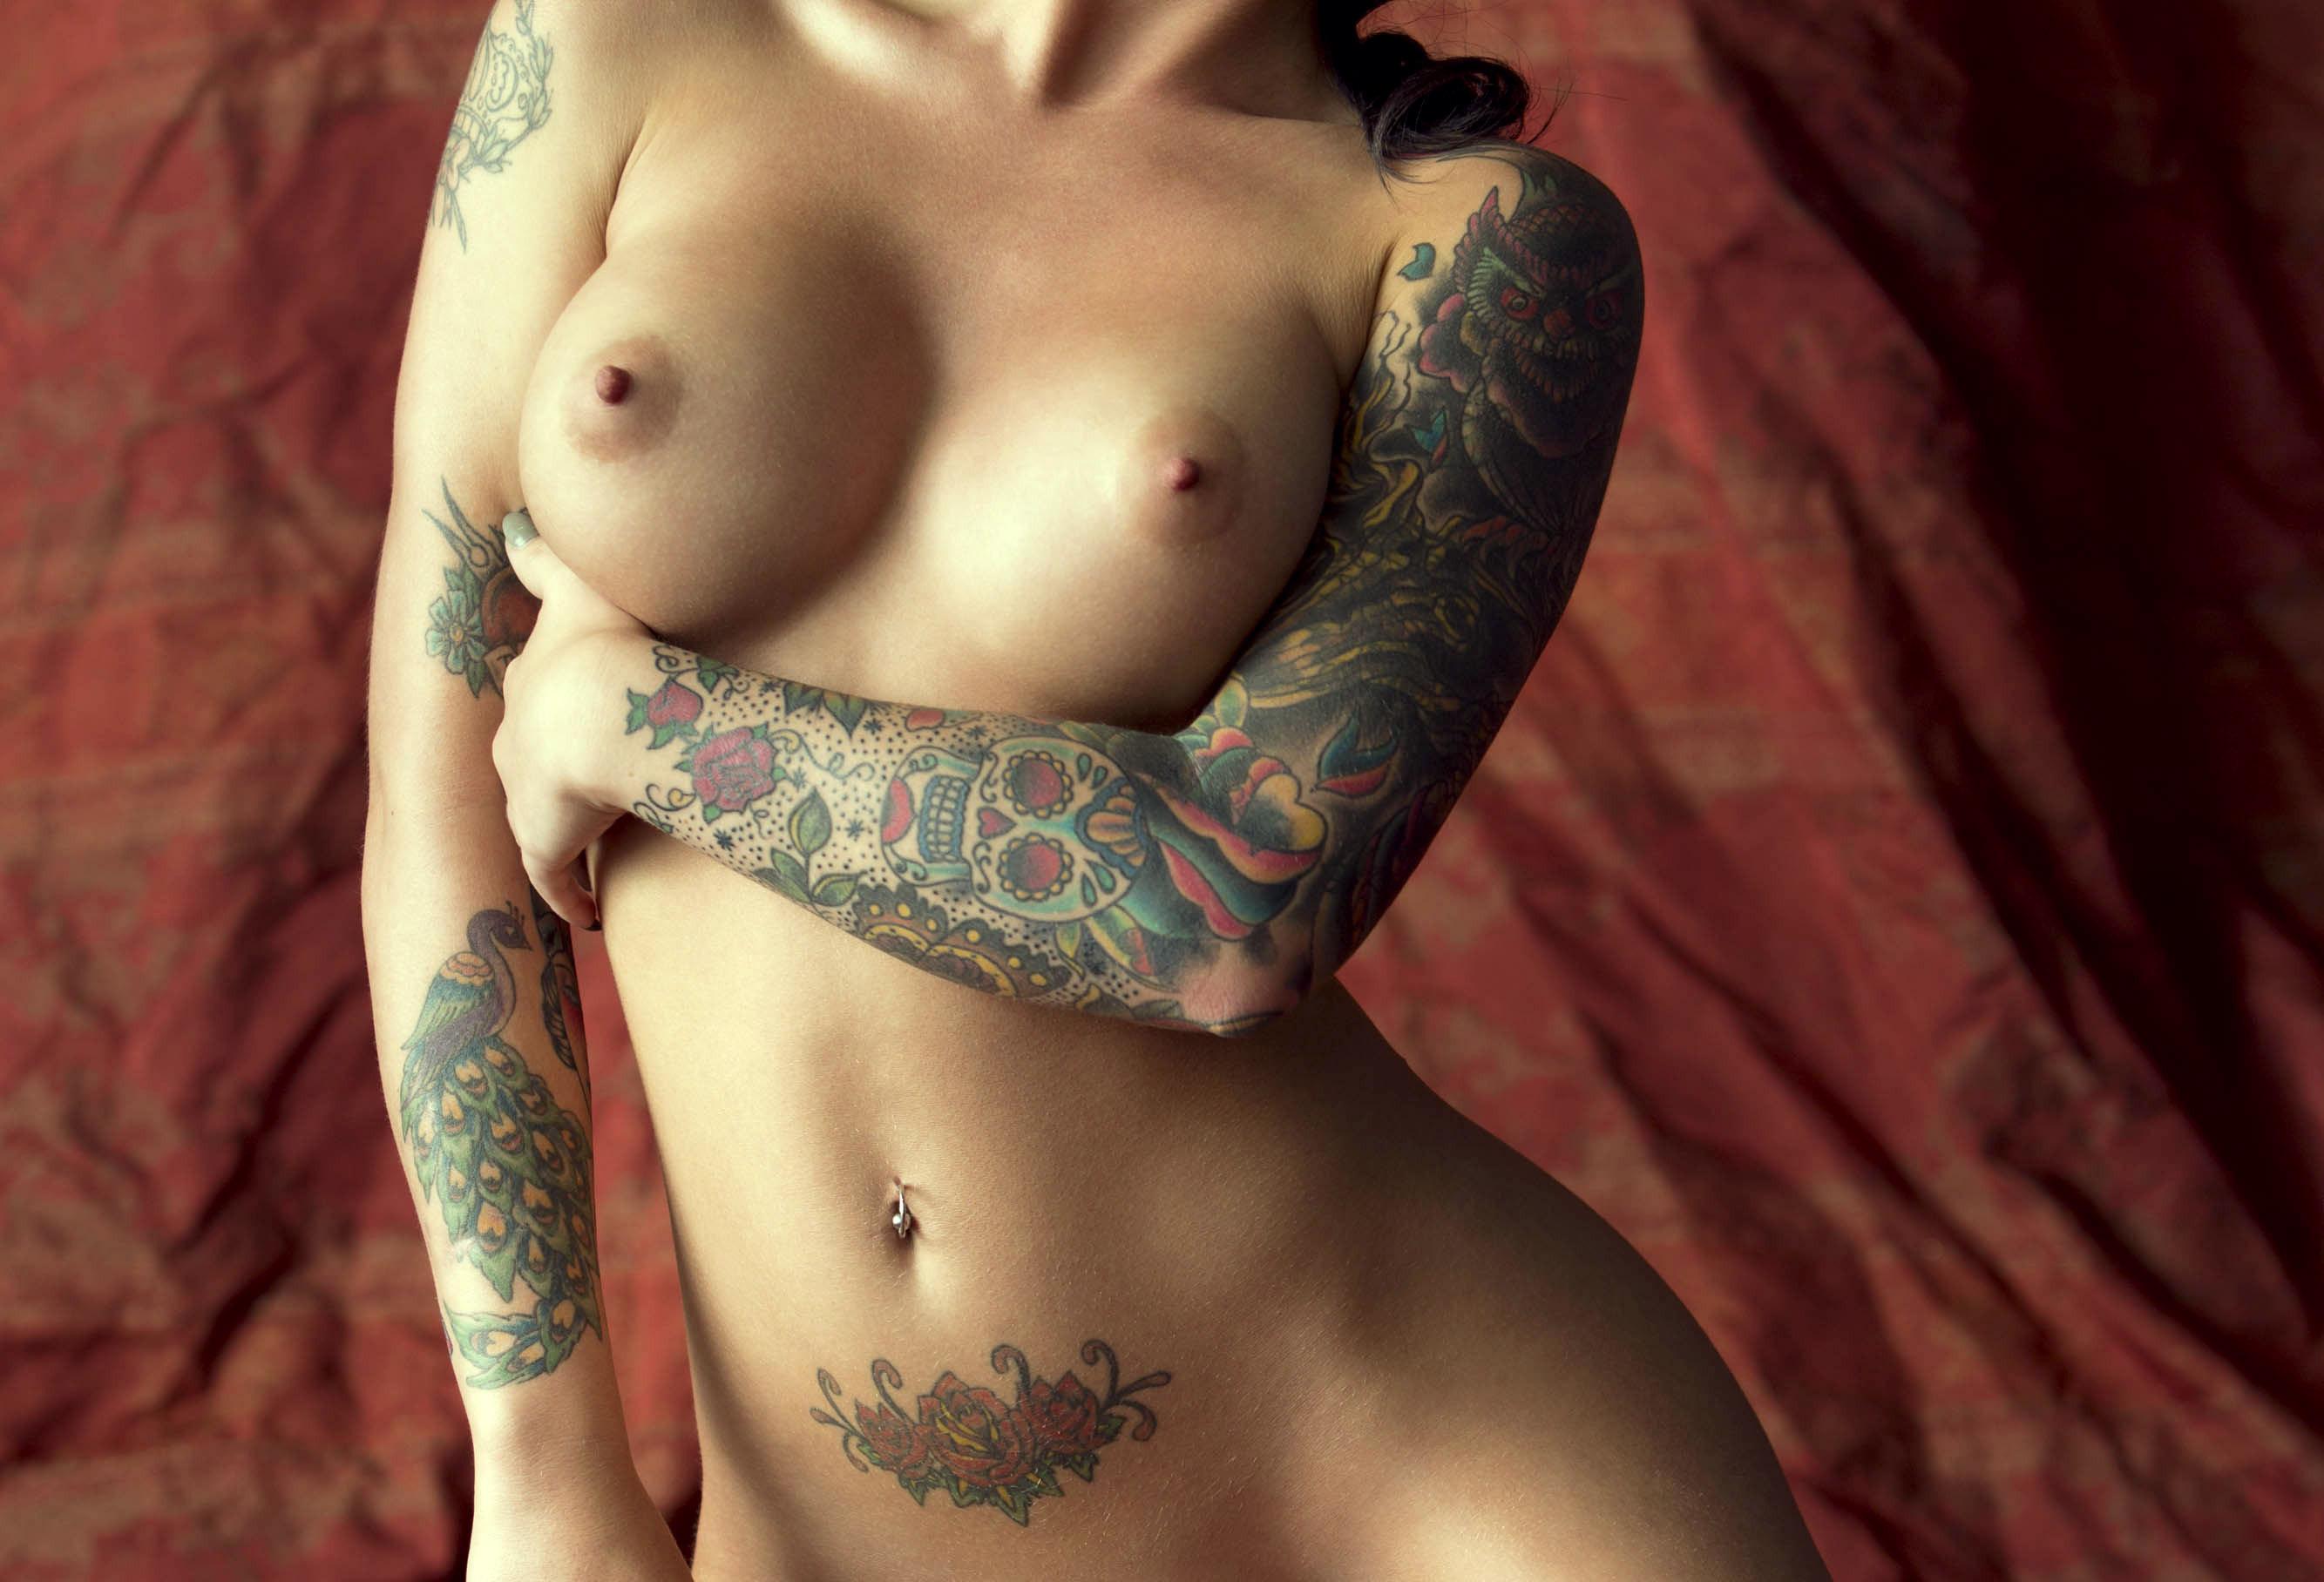 golie-siski-porno-aktrisi-blondinki-s-tatuirovkami-po-vsemu-telu